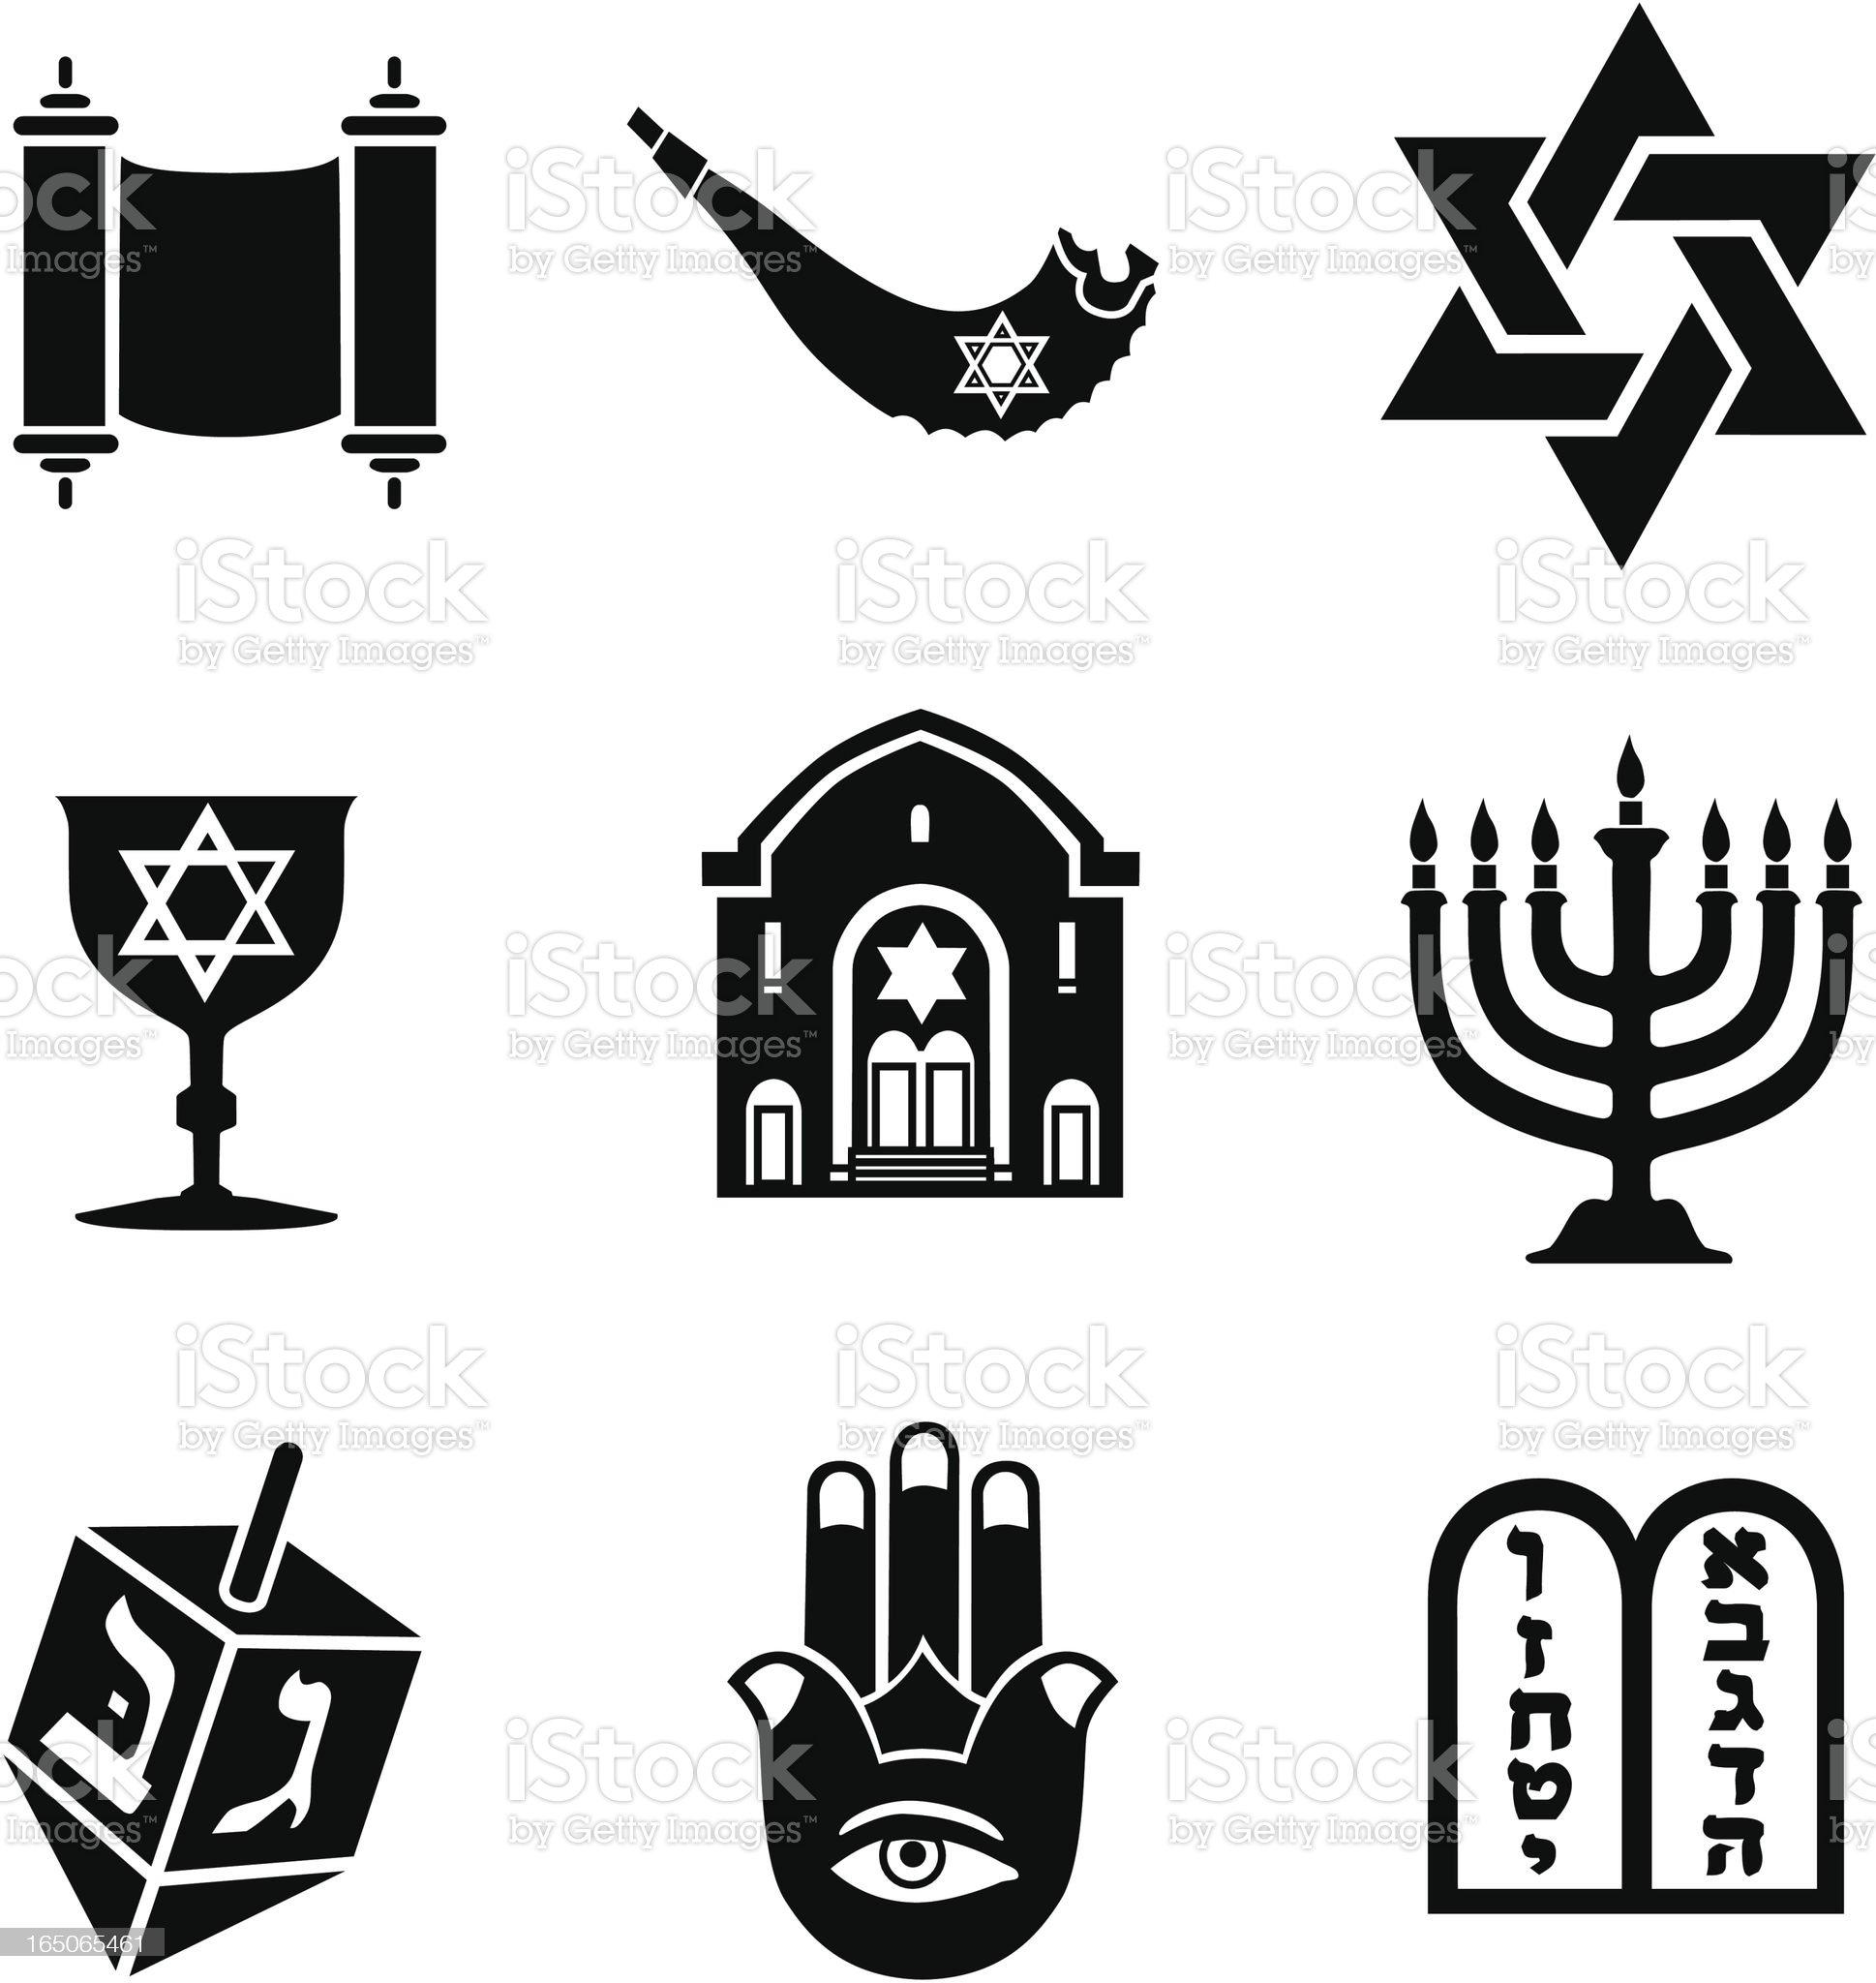 Jewish icons royalty-free stock vector art